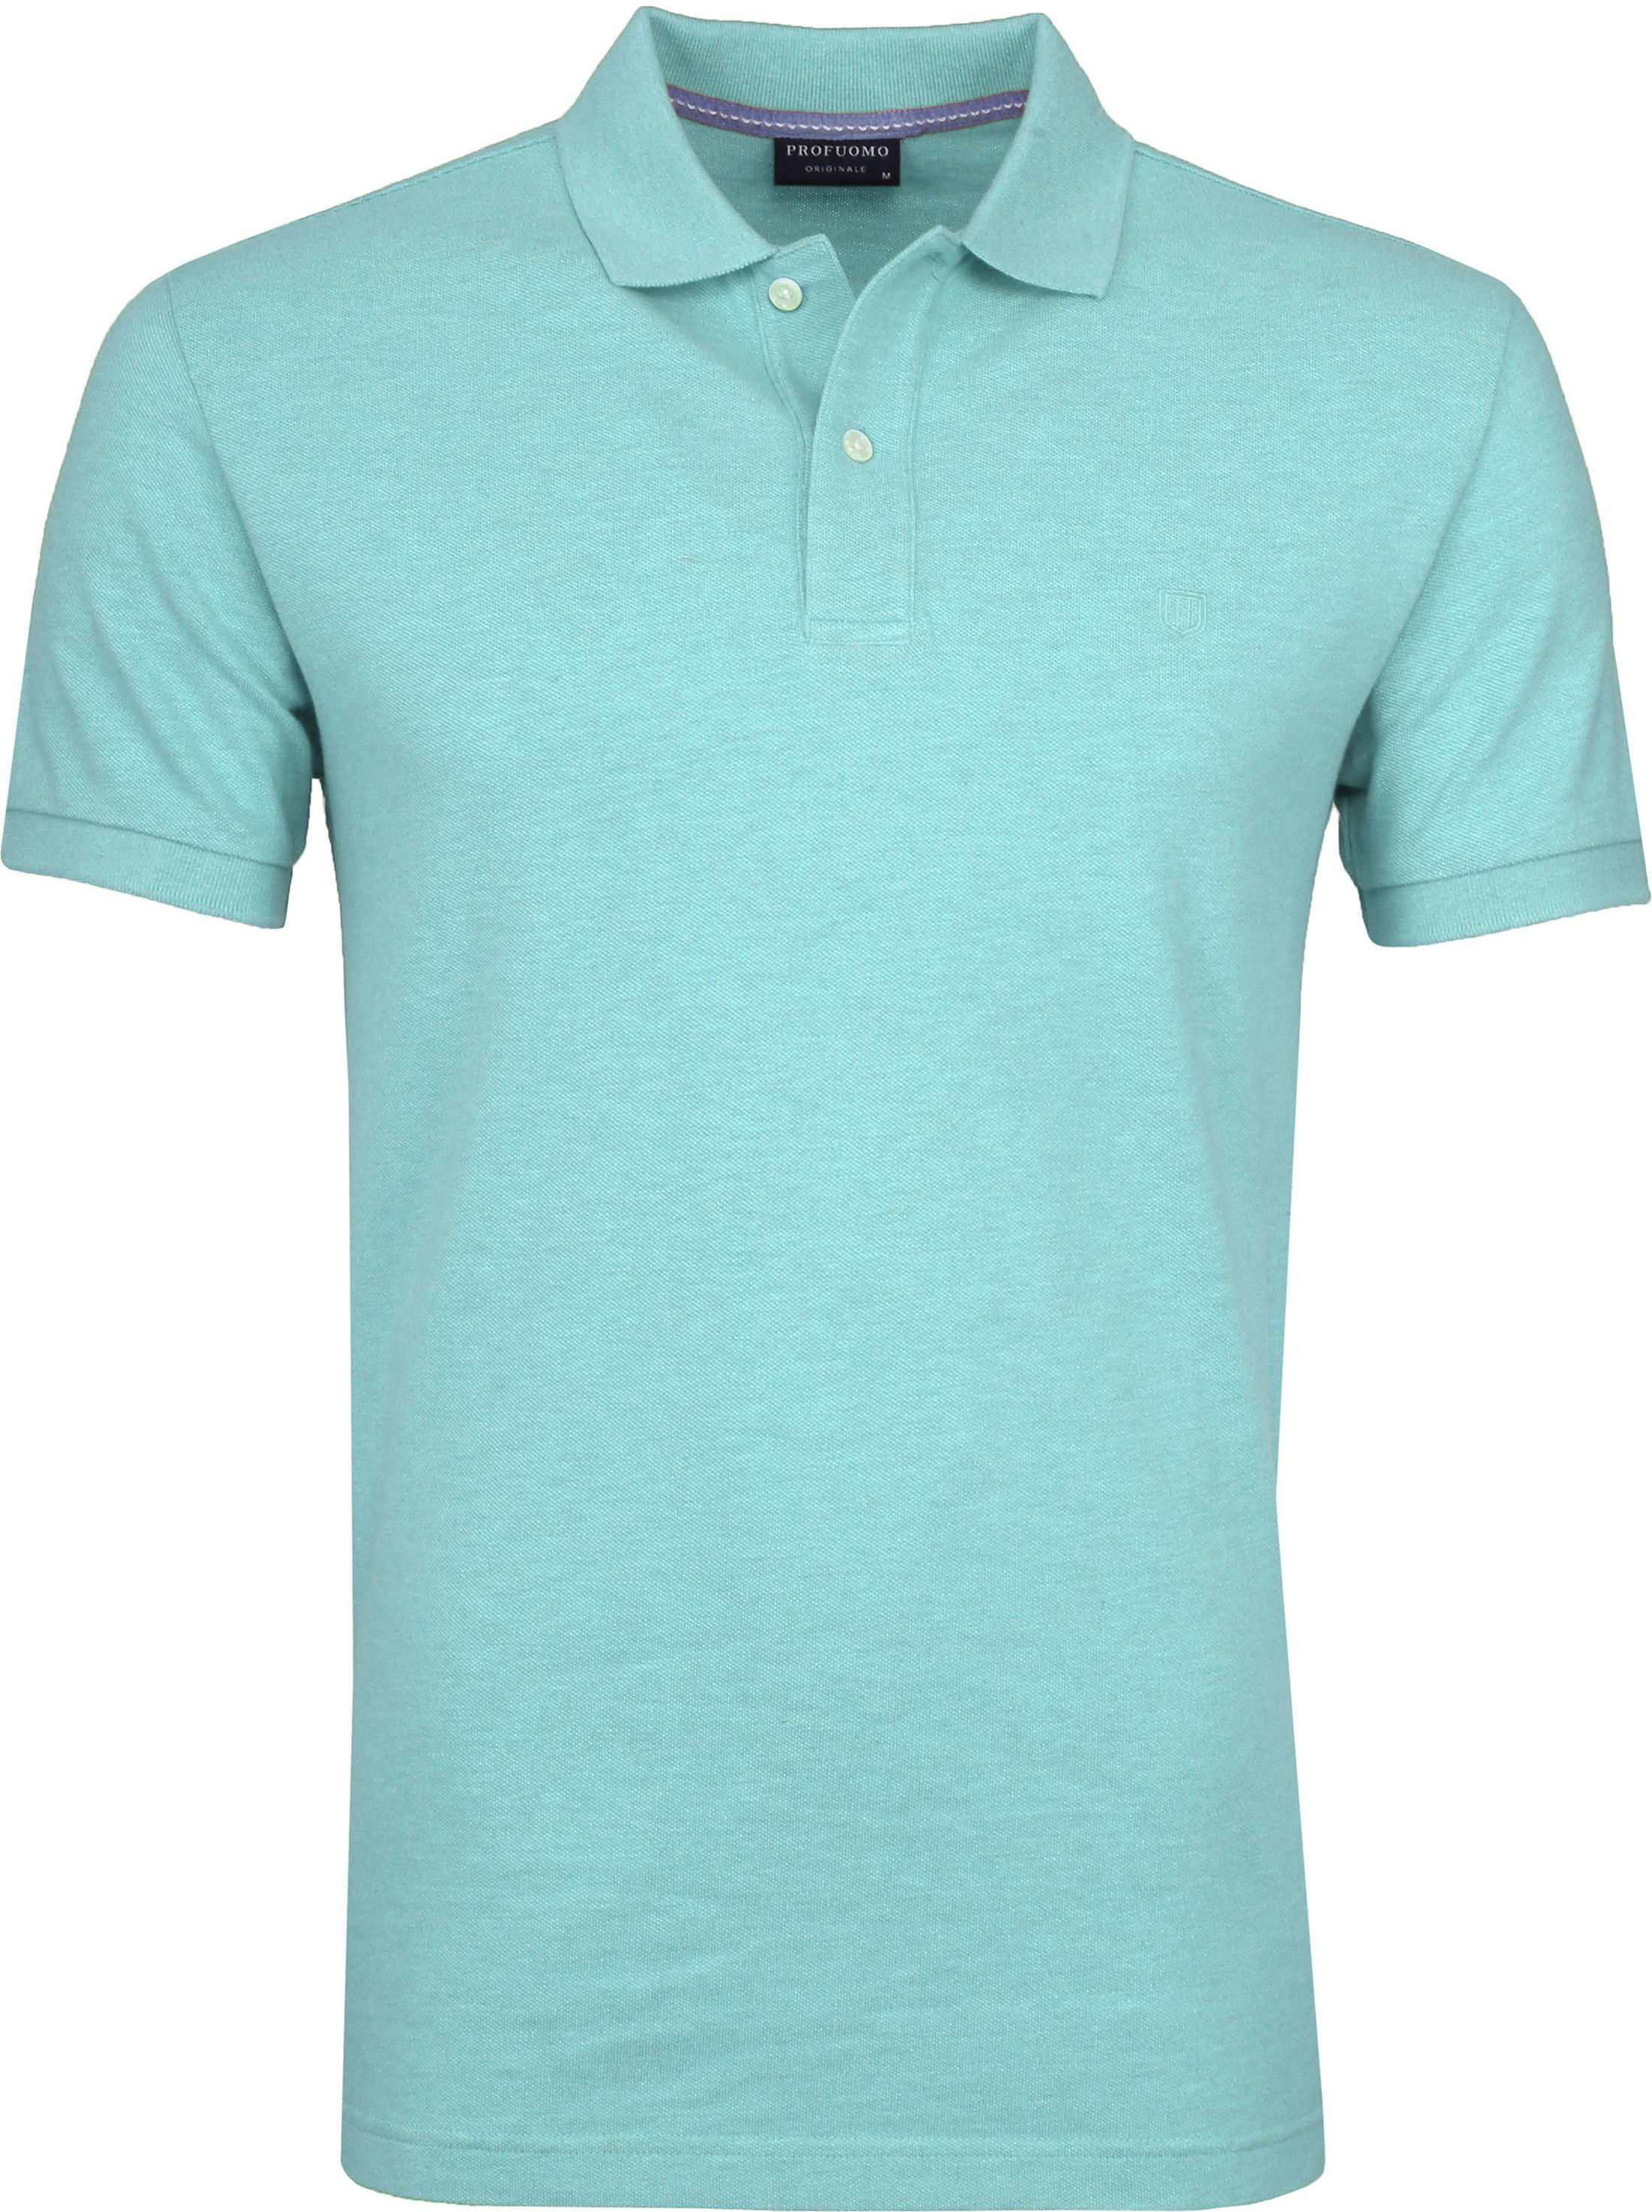 Profuomo Polo Melange Turquoise